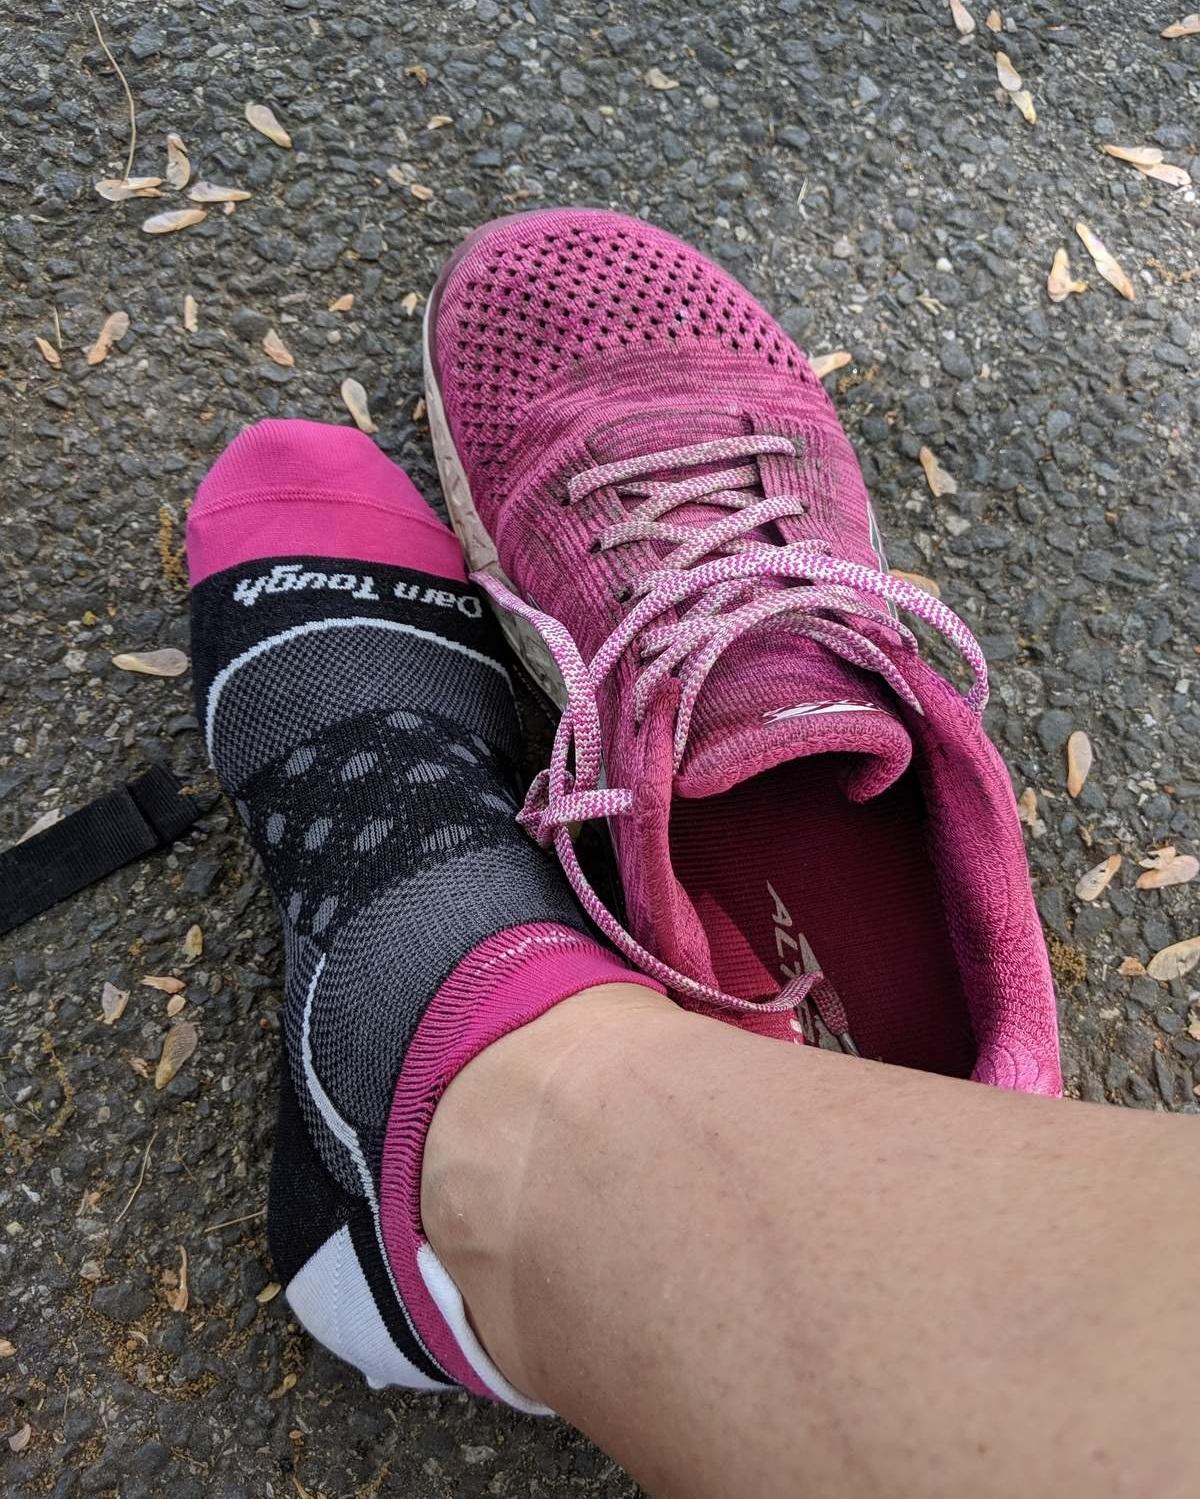 Hiking Socks - Darn Tough Quarter HikerRead why→